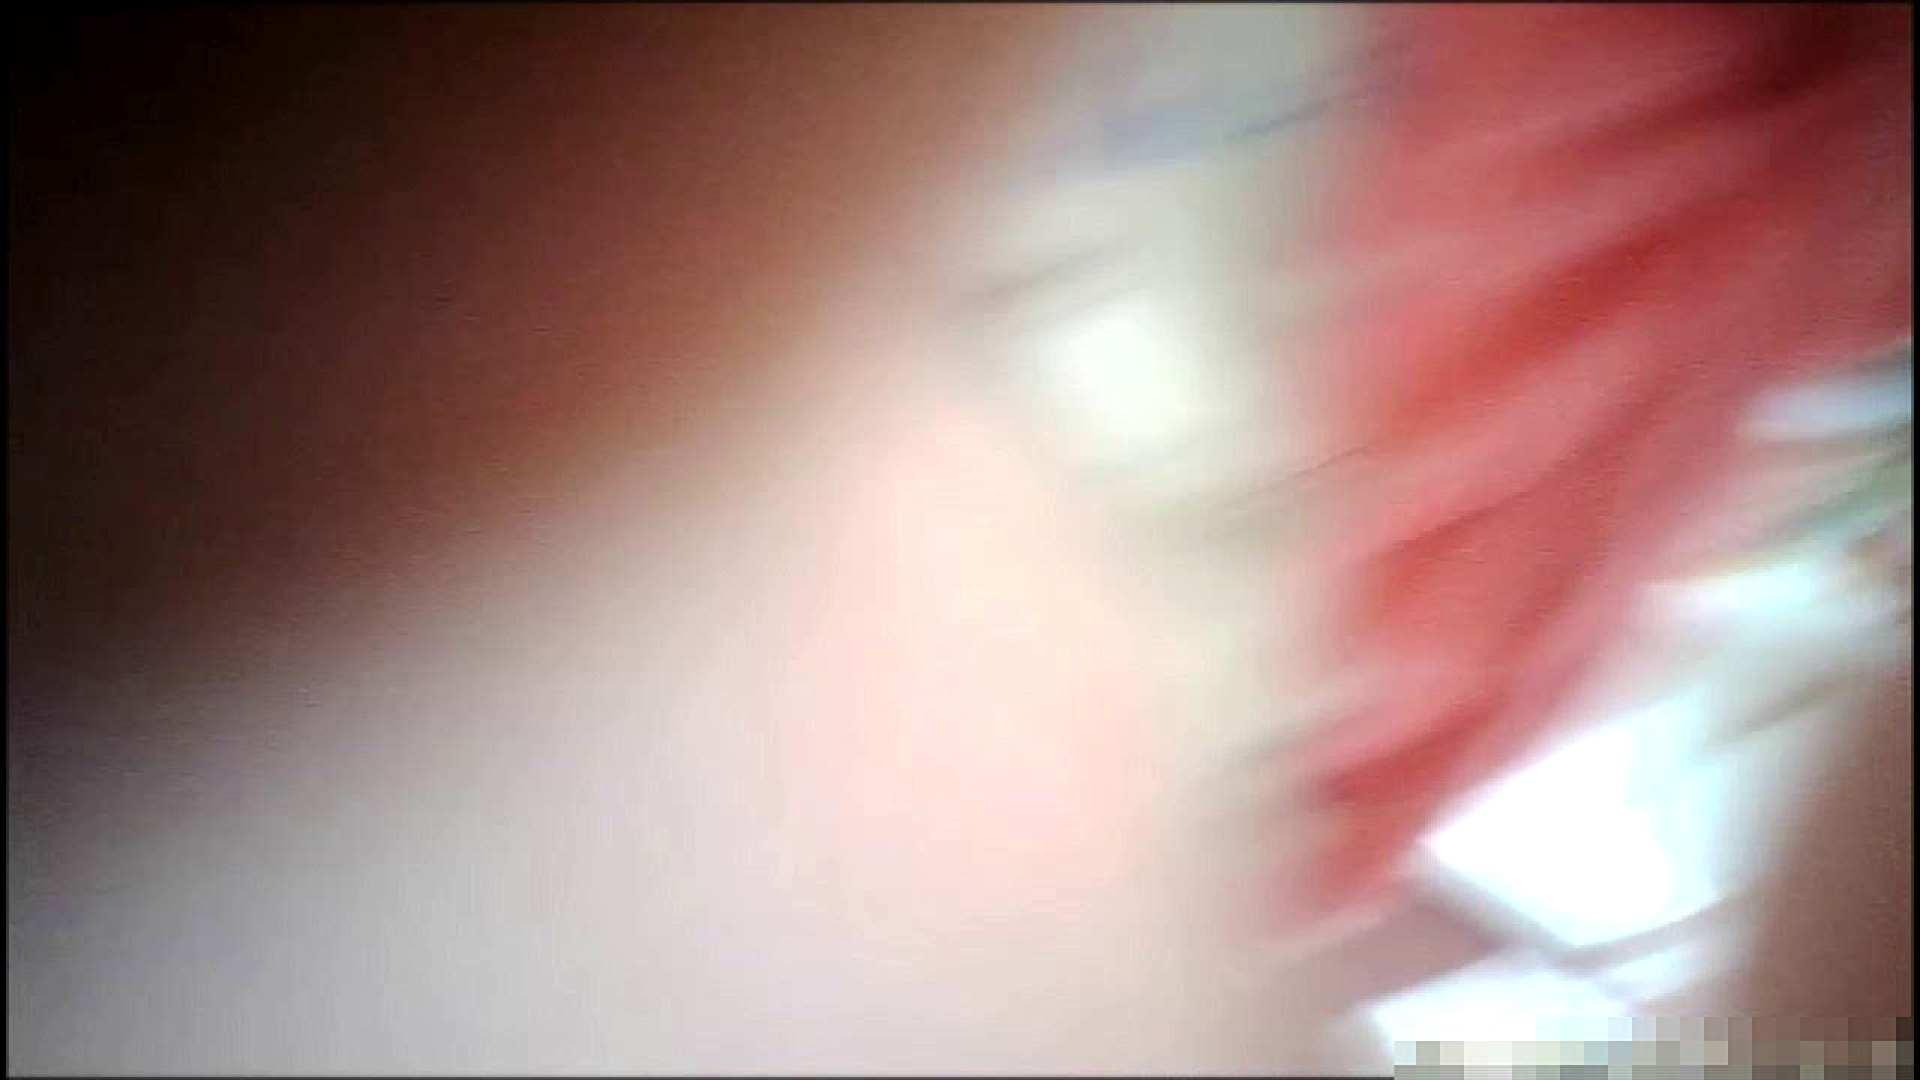 NO.1 普段から胸元がゆるい友達【某ファッションビル内の雑貨屋】 友人 | 胸チラ  68連発 42